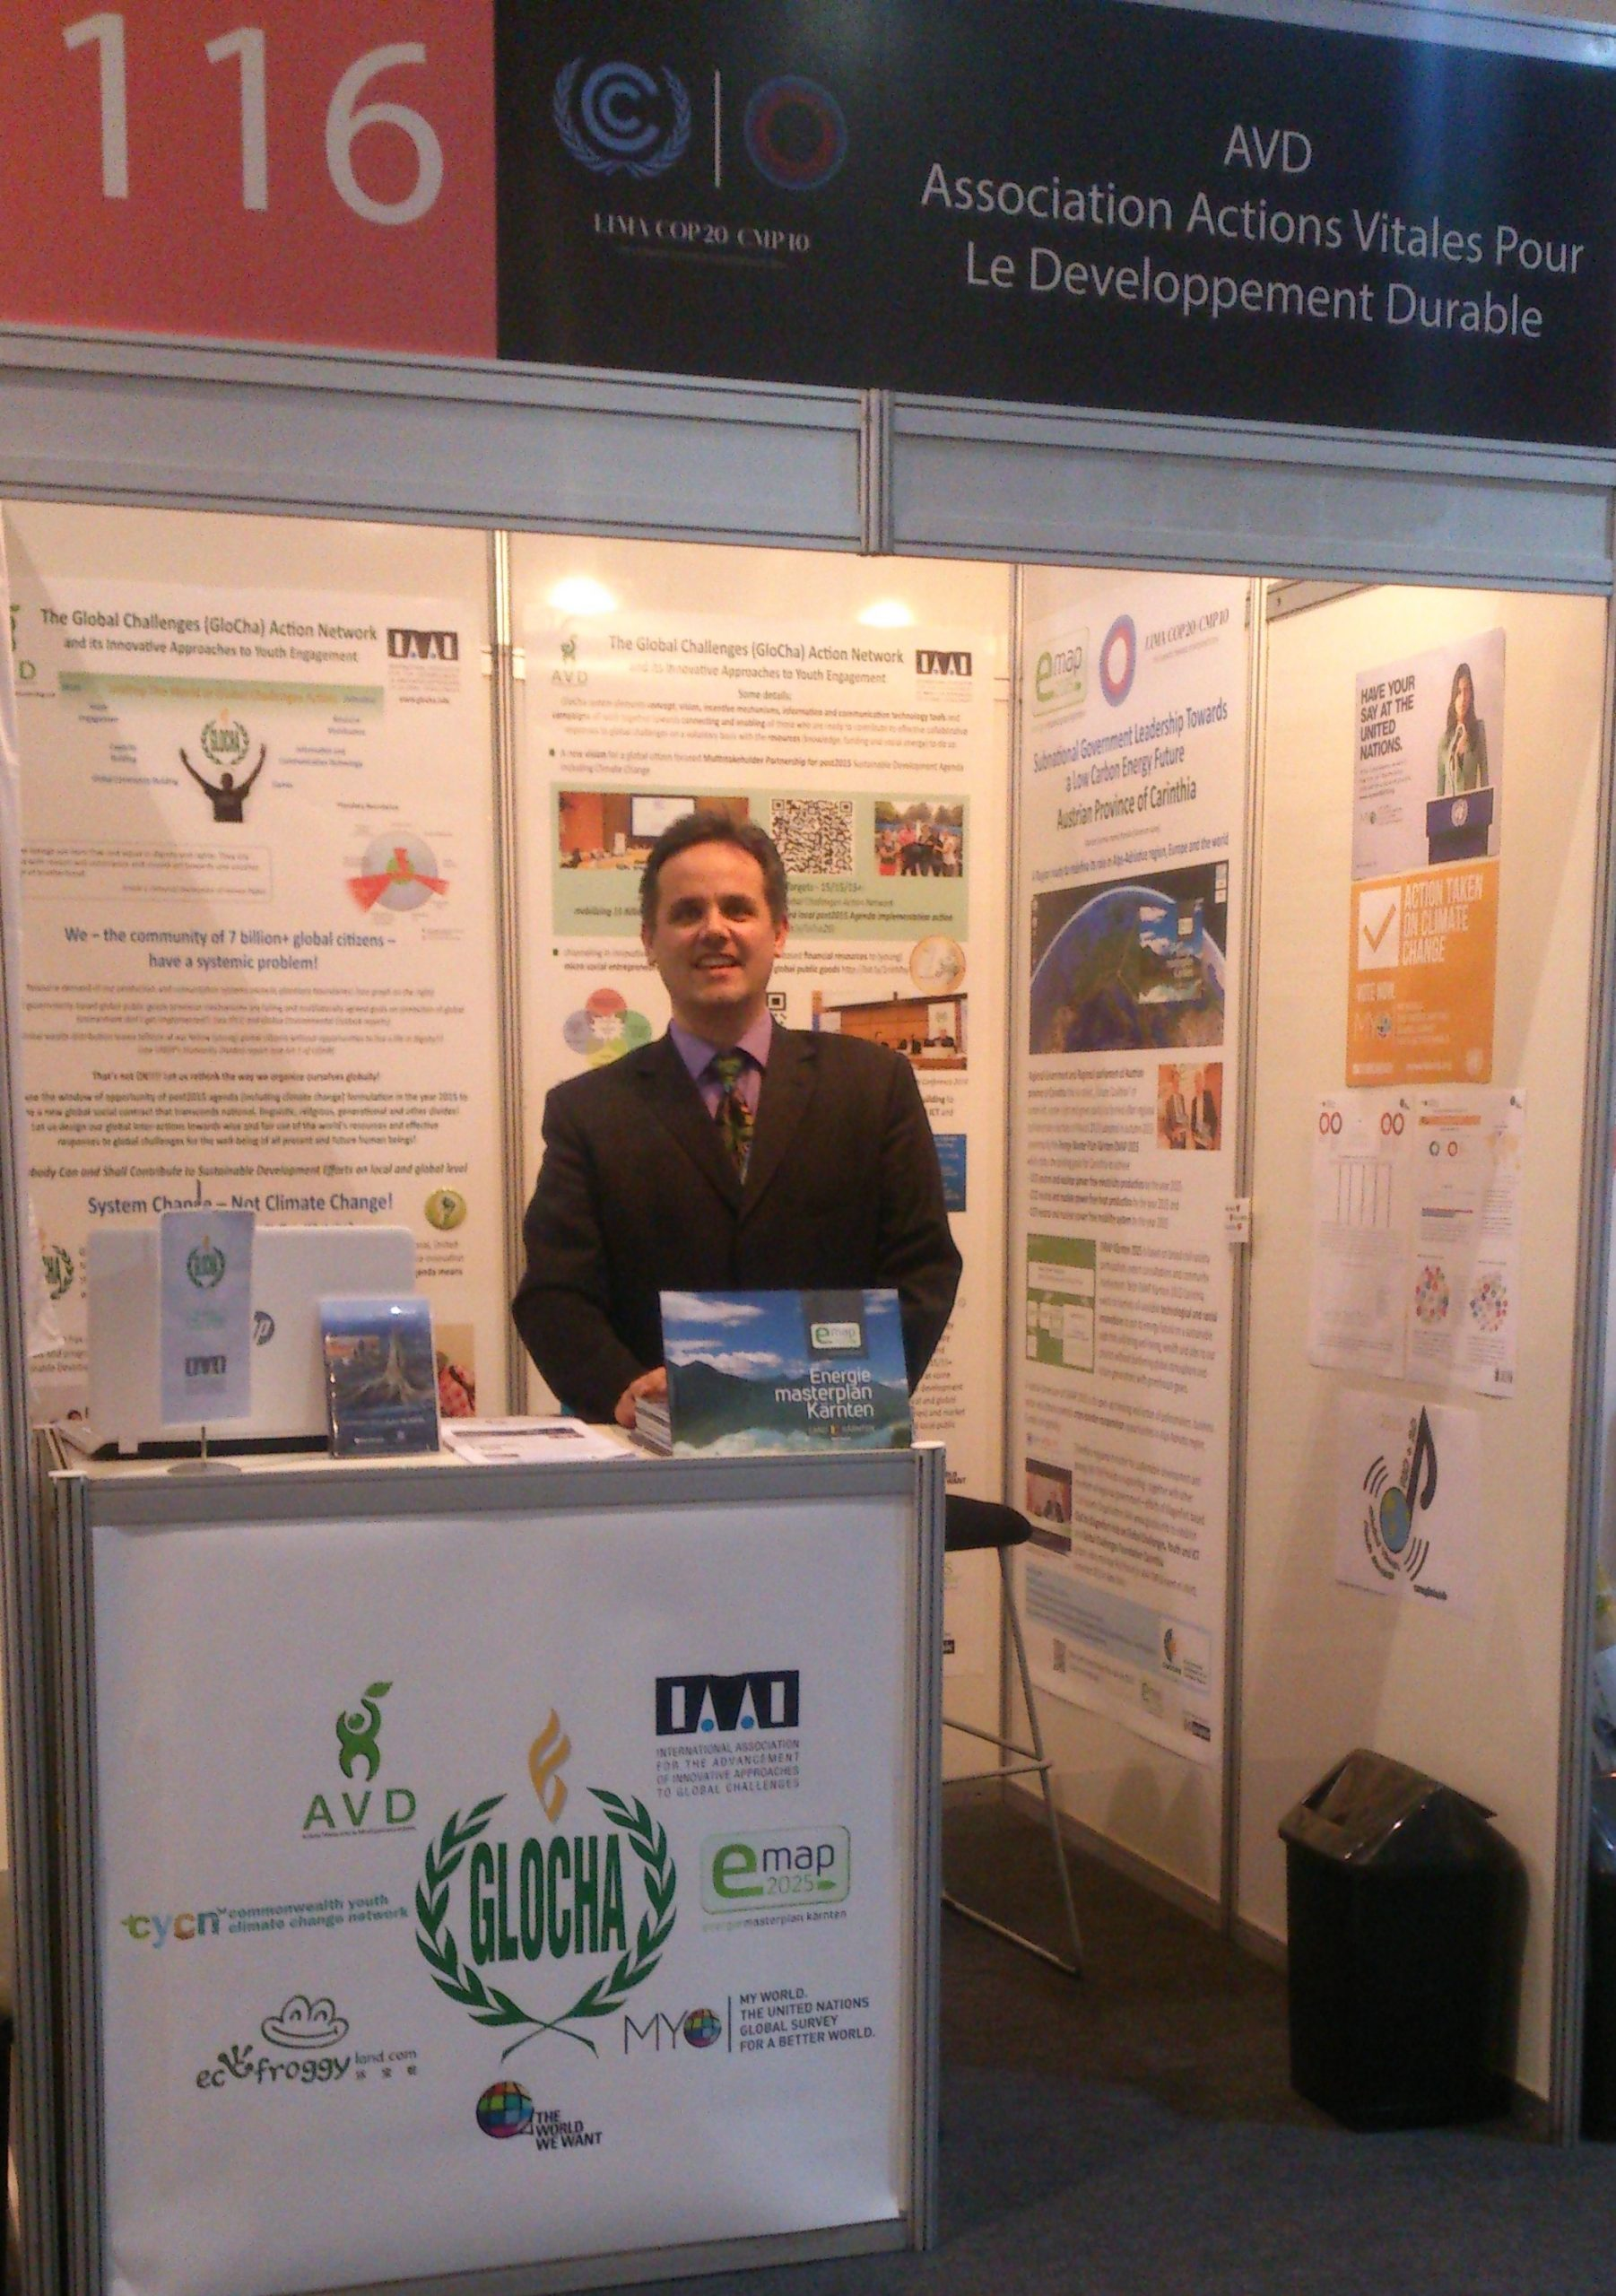 Lima COP20 IAAI GloCha EMAP Stand Photo mitPolzer 2